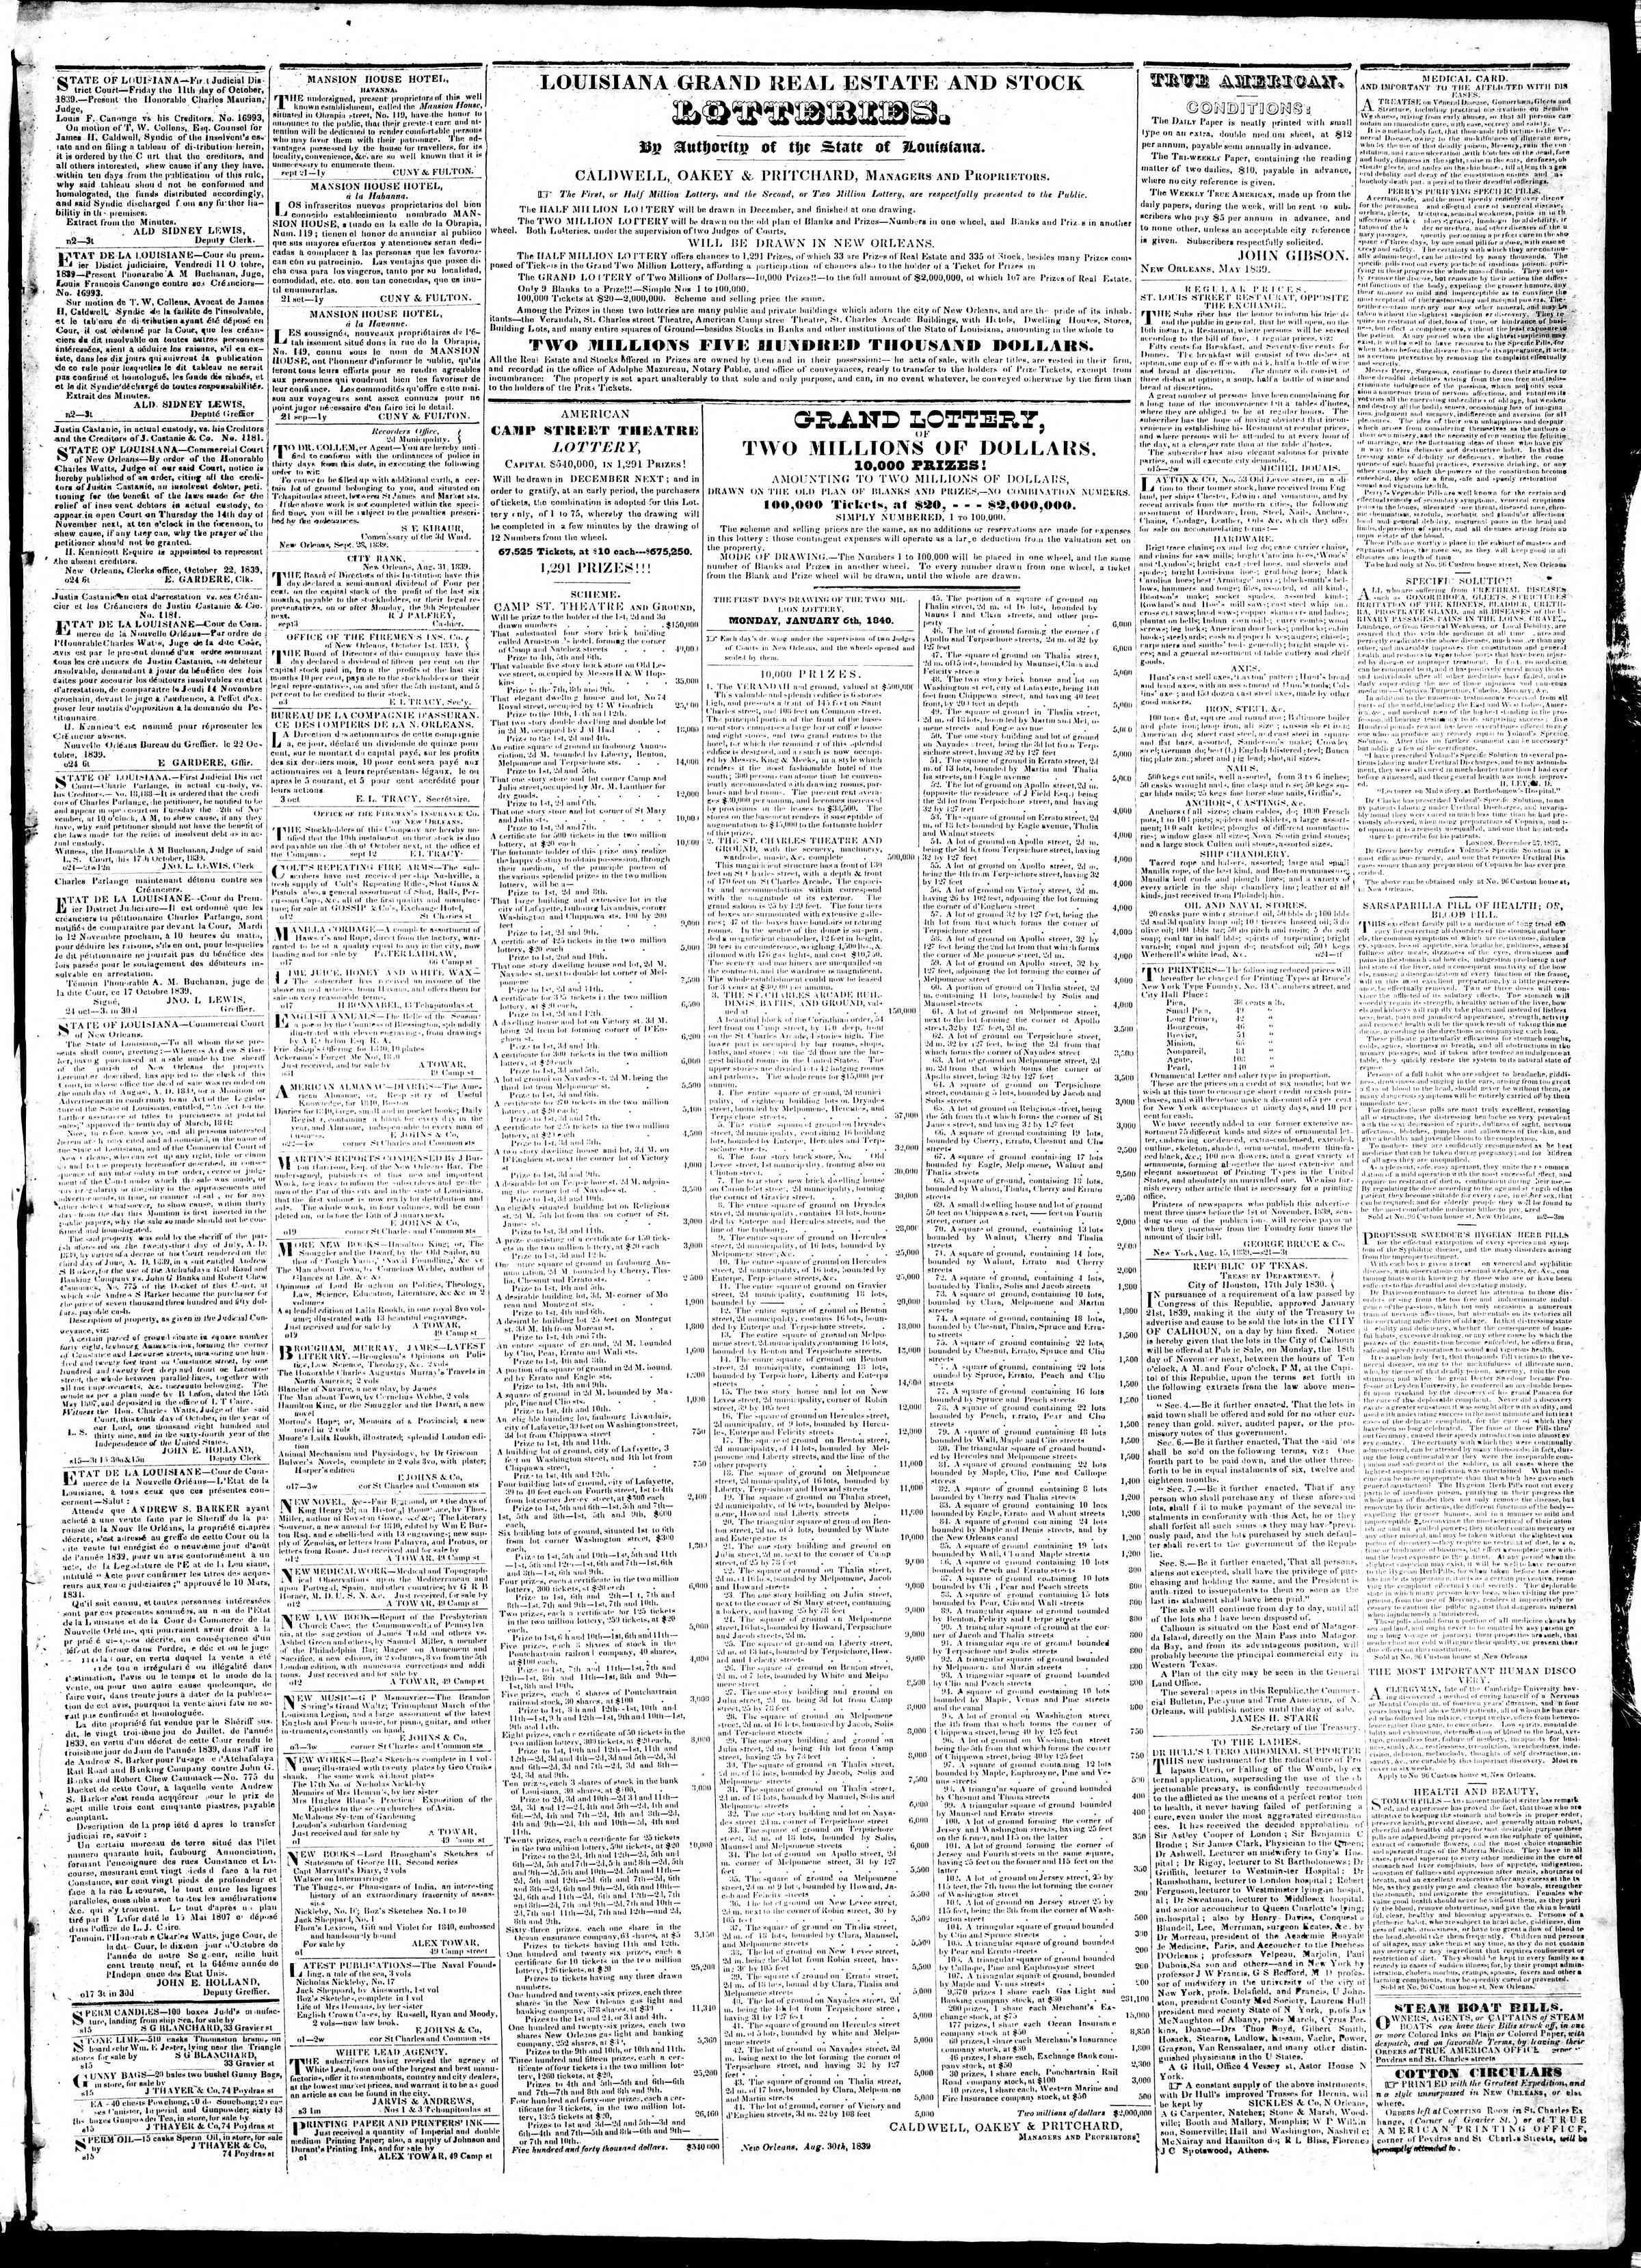 November 8, 1839 Tarihli True American Gazetesi Sayfa 3